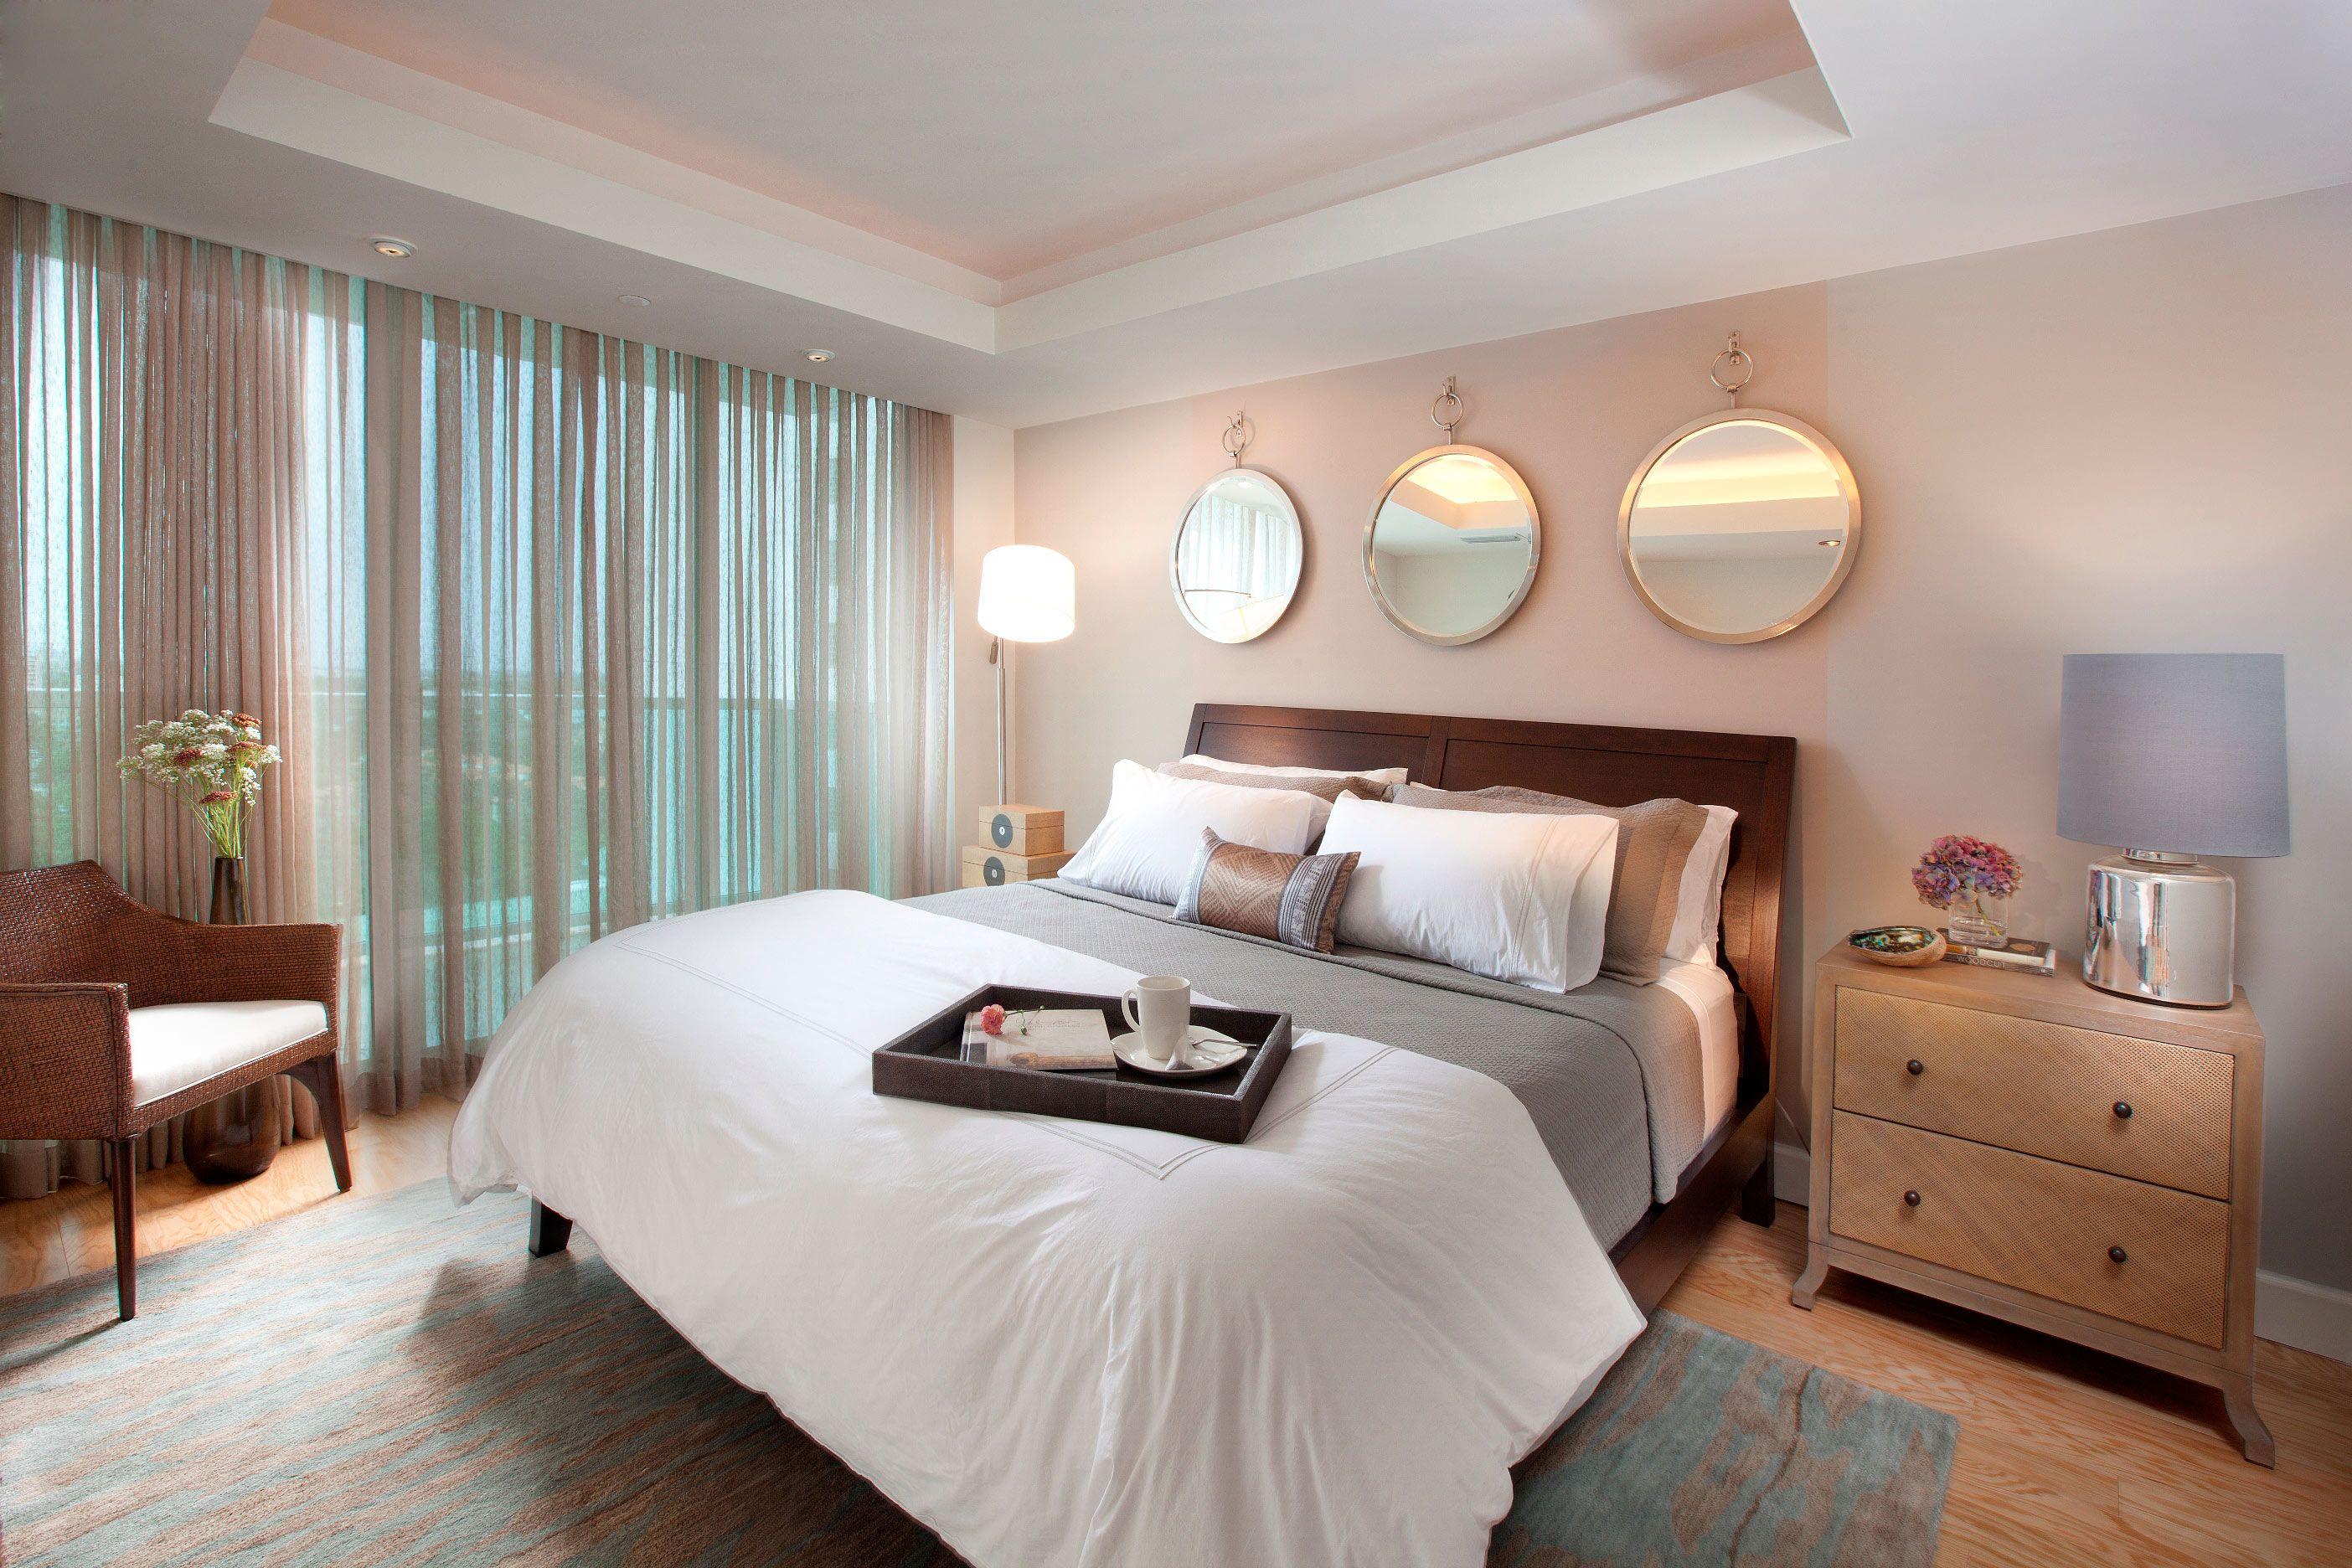 Modern Residential Design With Warm Interior Google